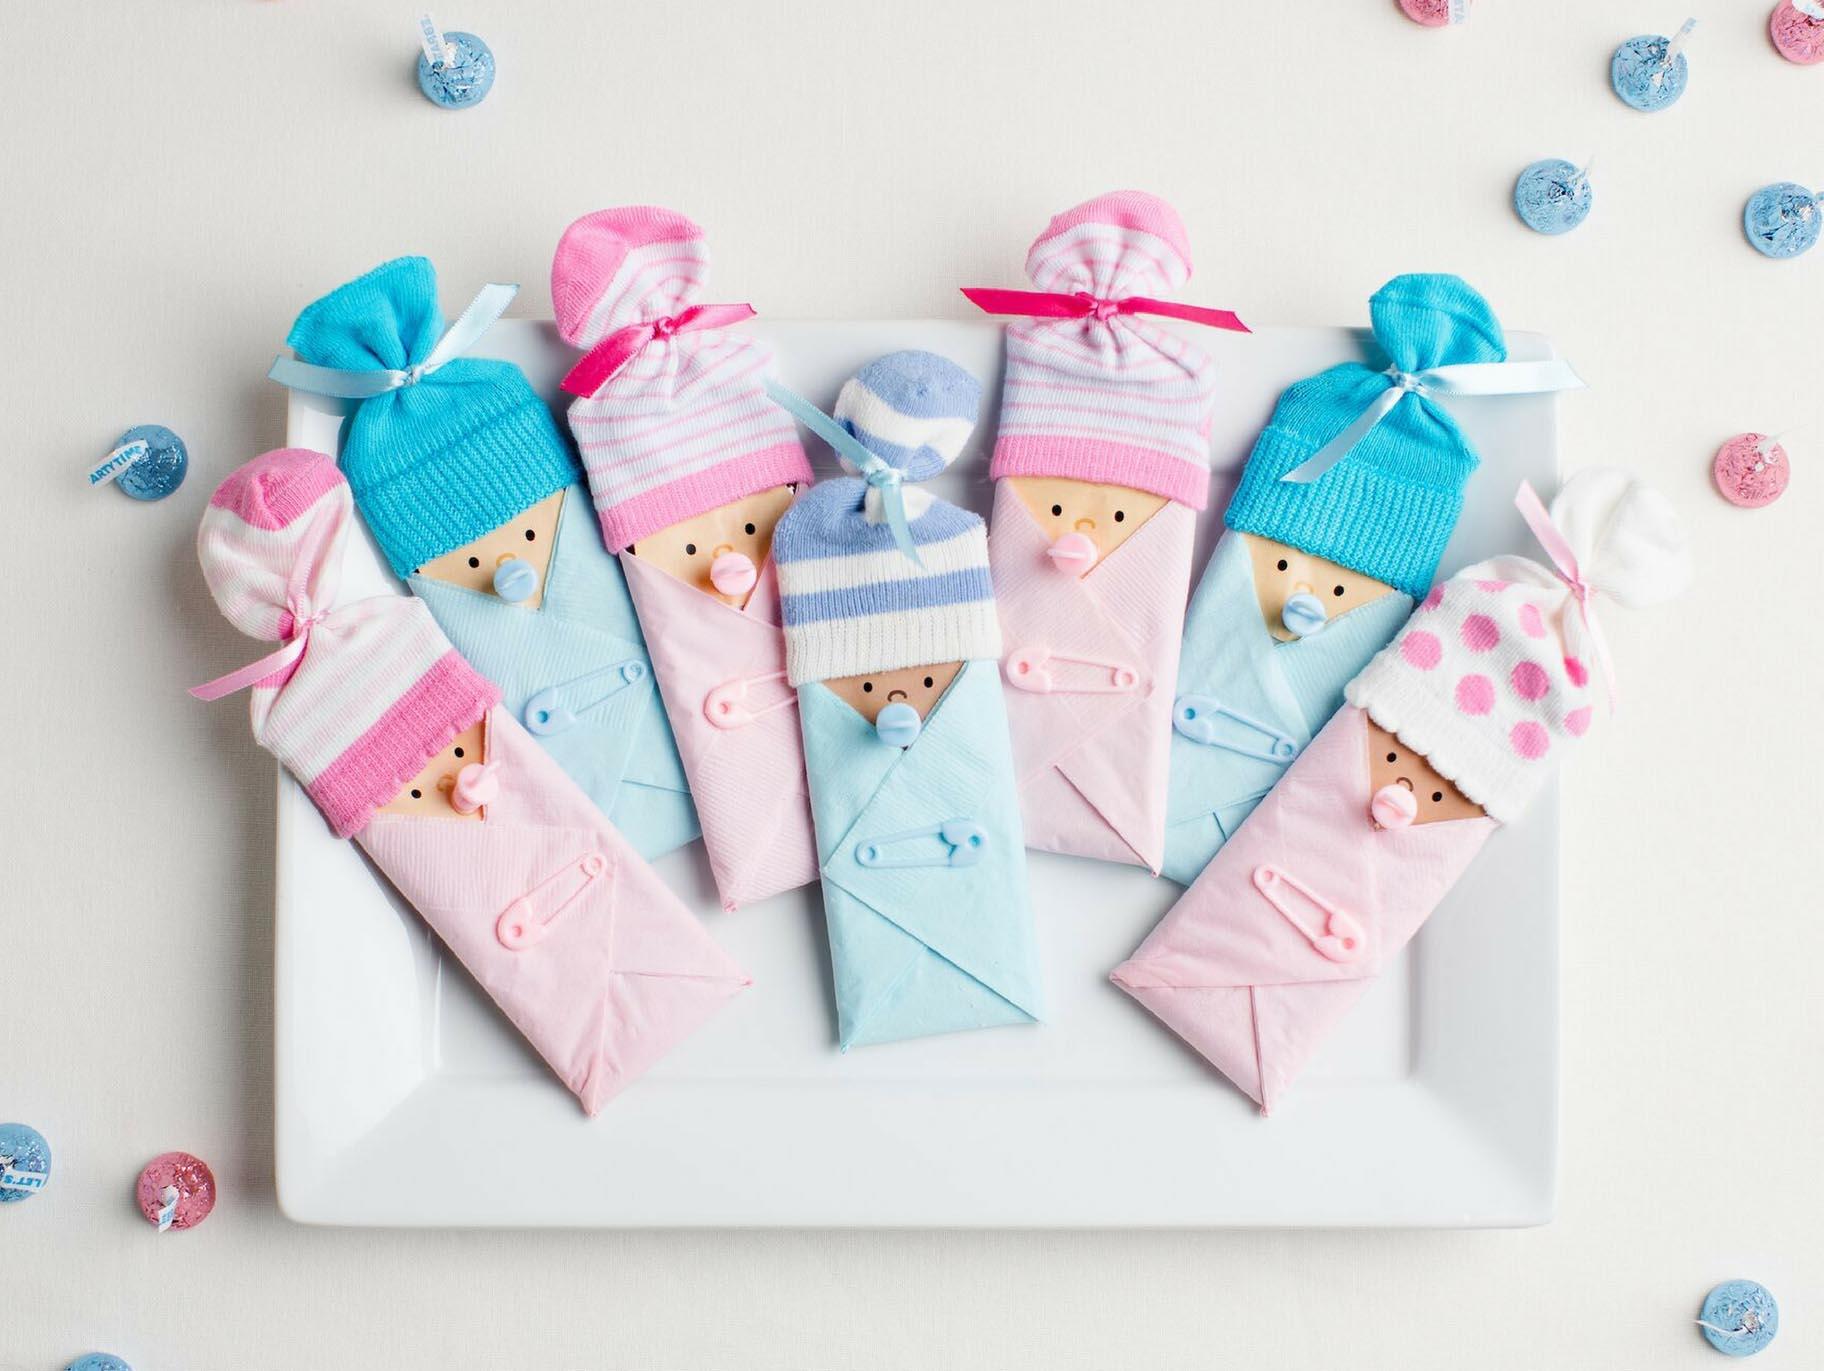 10 Lovely Girl Baby Shower Favors Ideas baby shower candy bar favor idea 2020